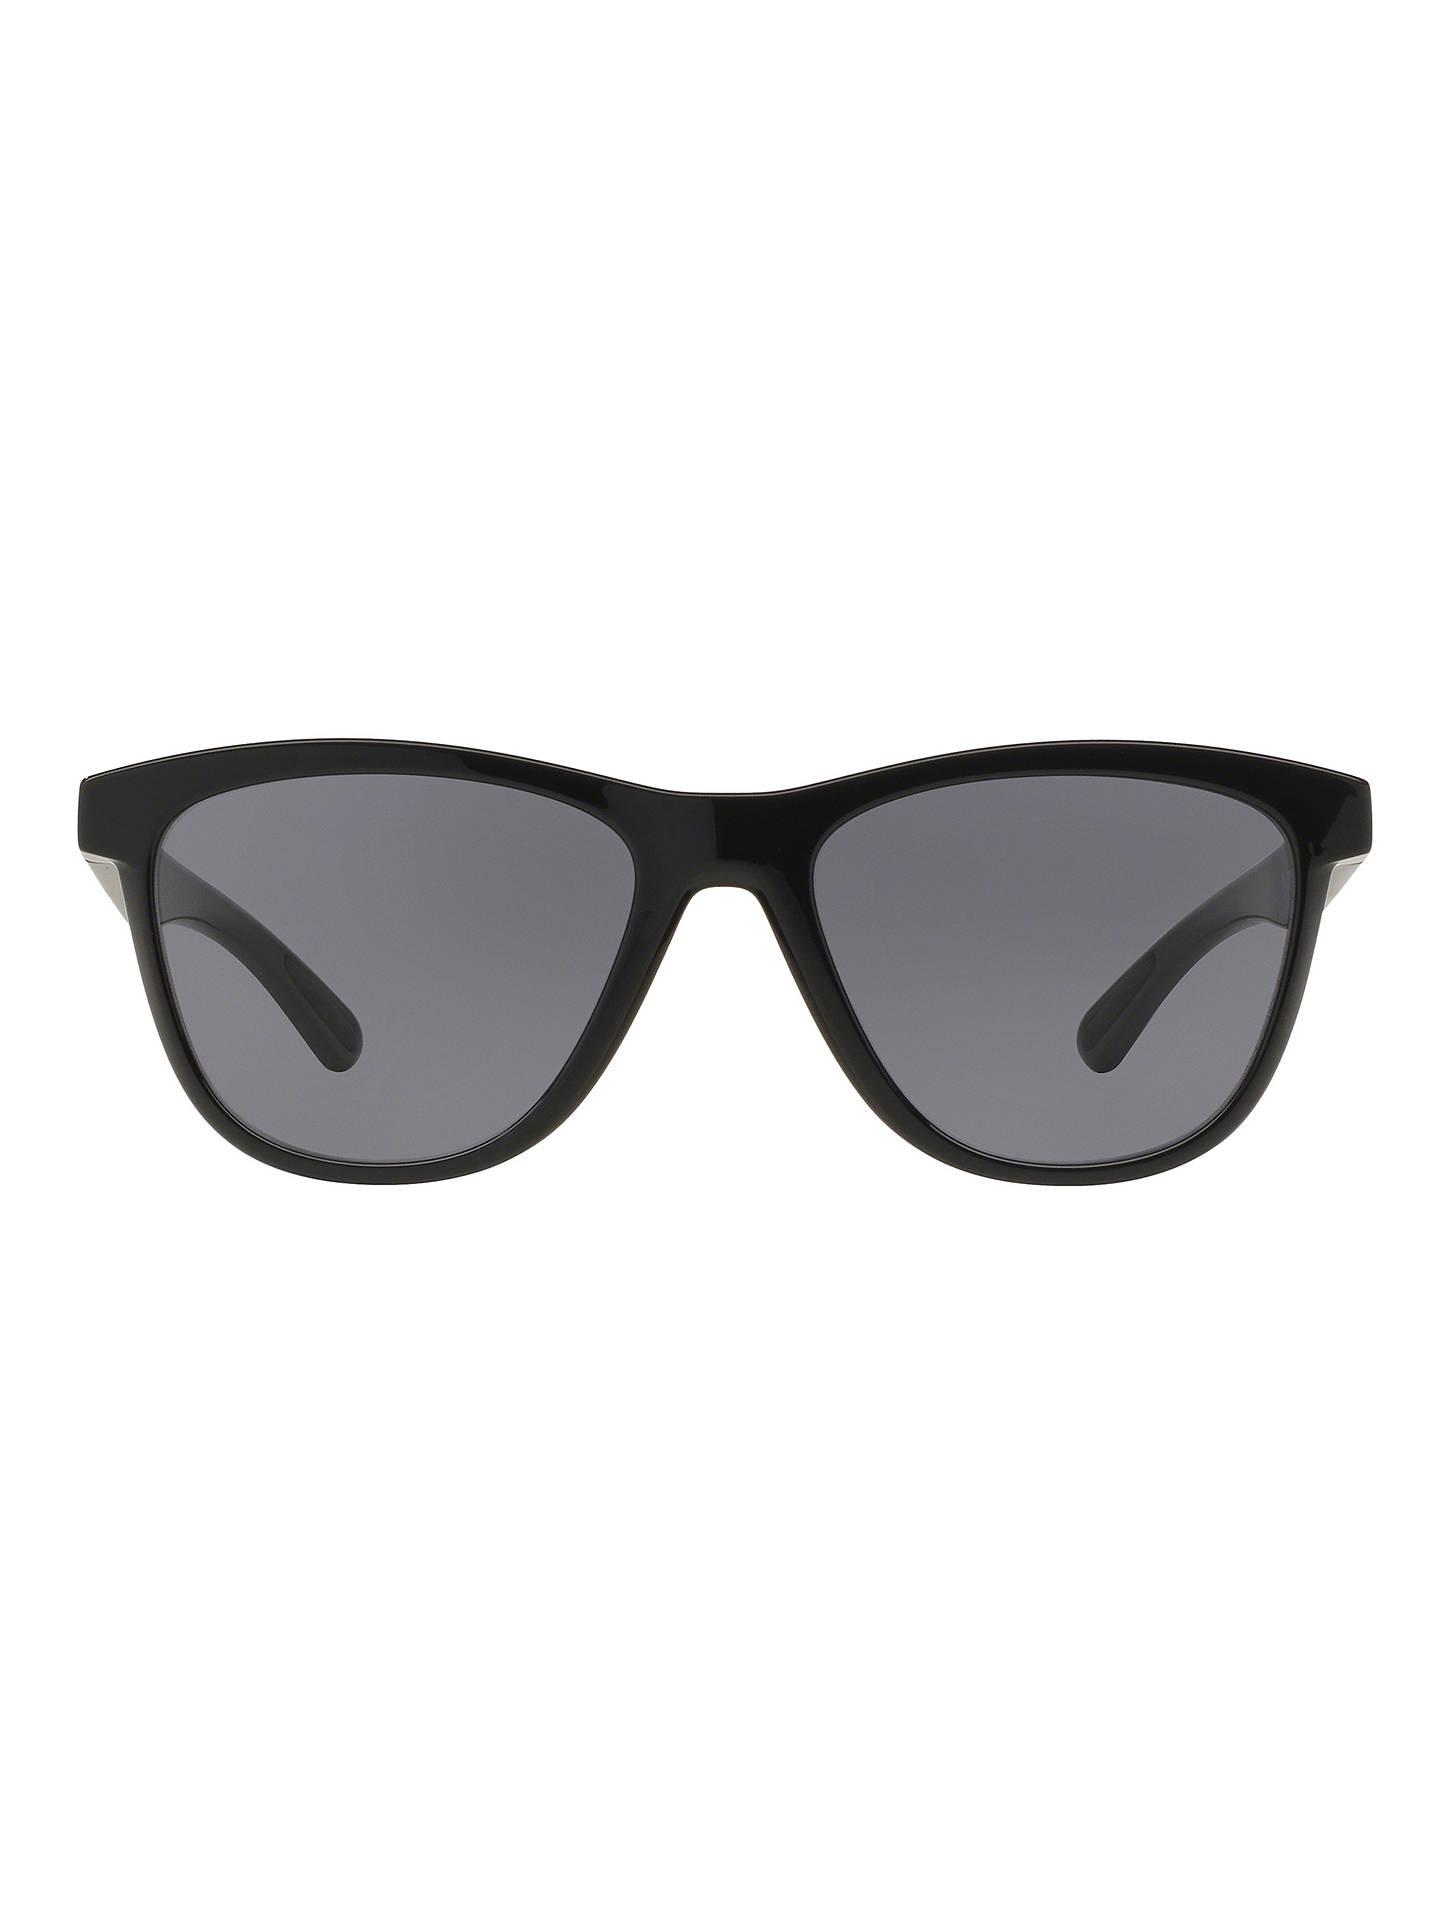 bf1b1483d6 Oakley OO9320 Moonlighter D-Frame Sunglasses at John Lewis   Partners